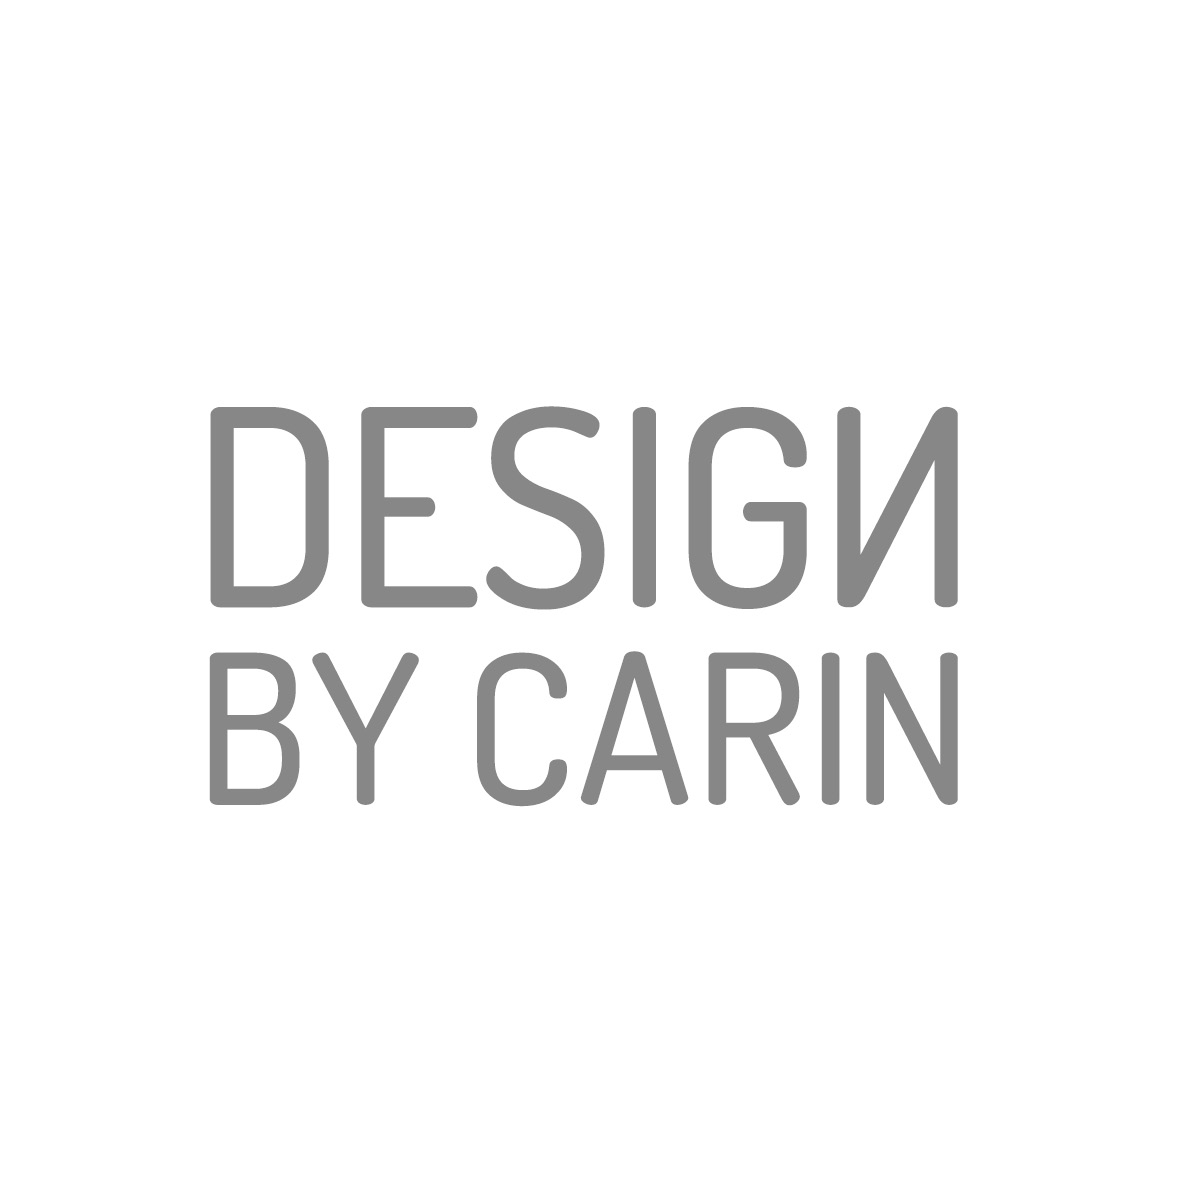 Designbycarin